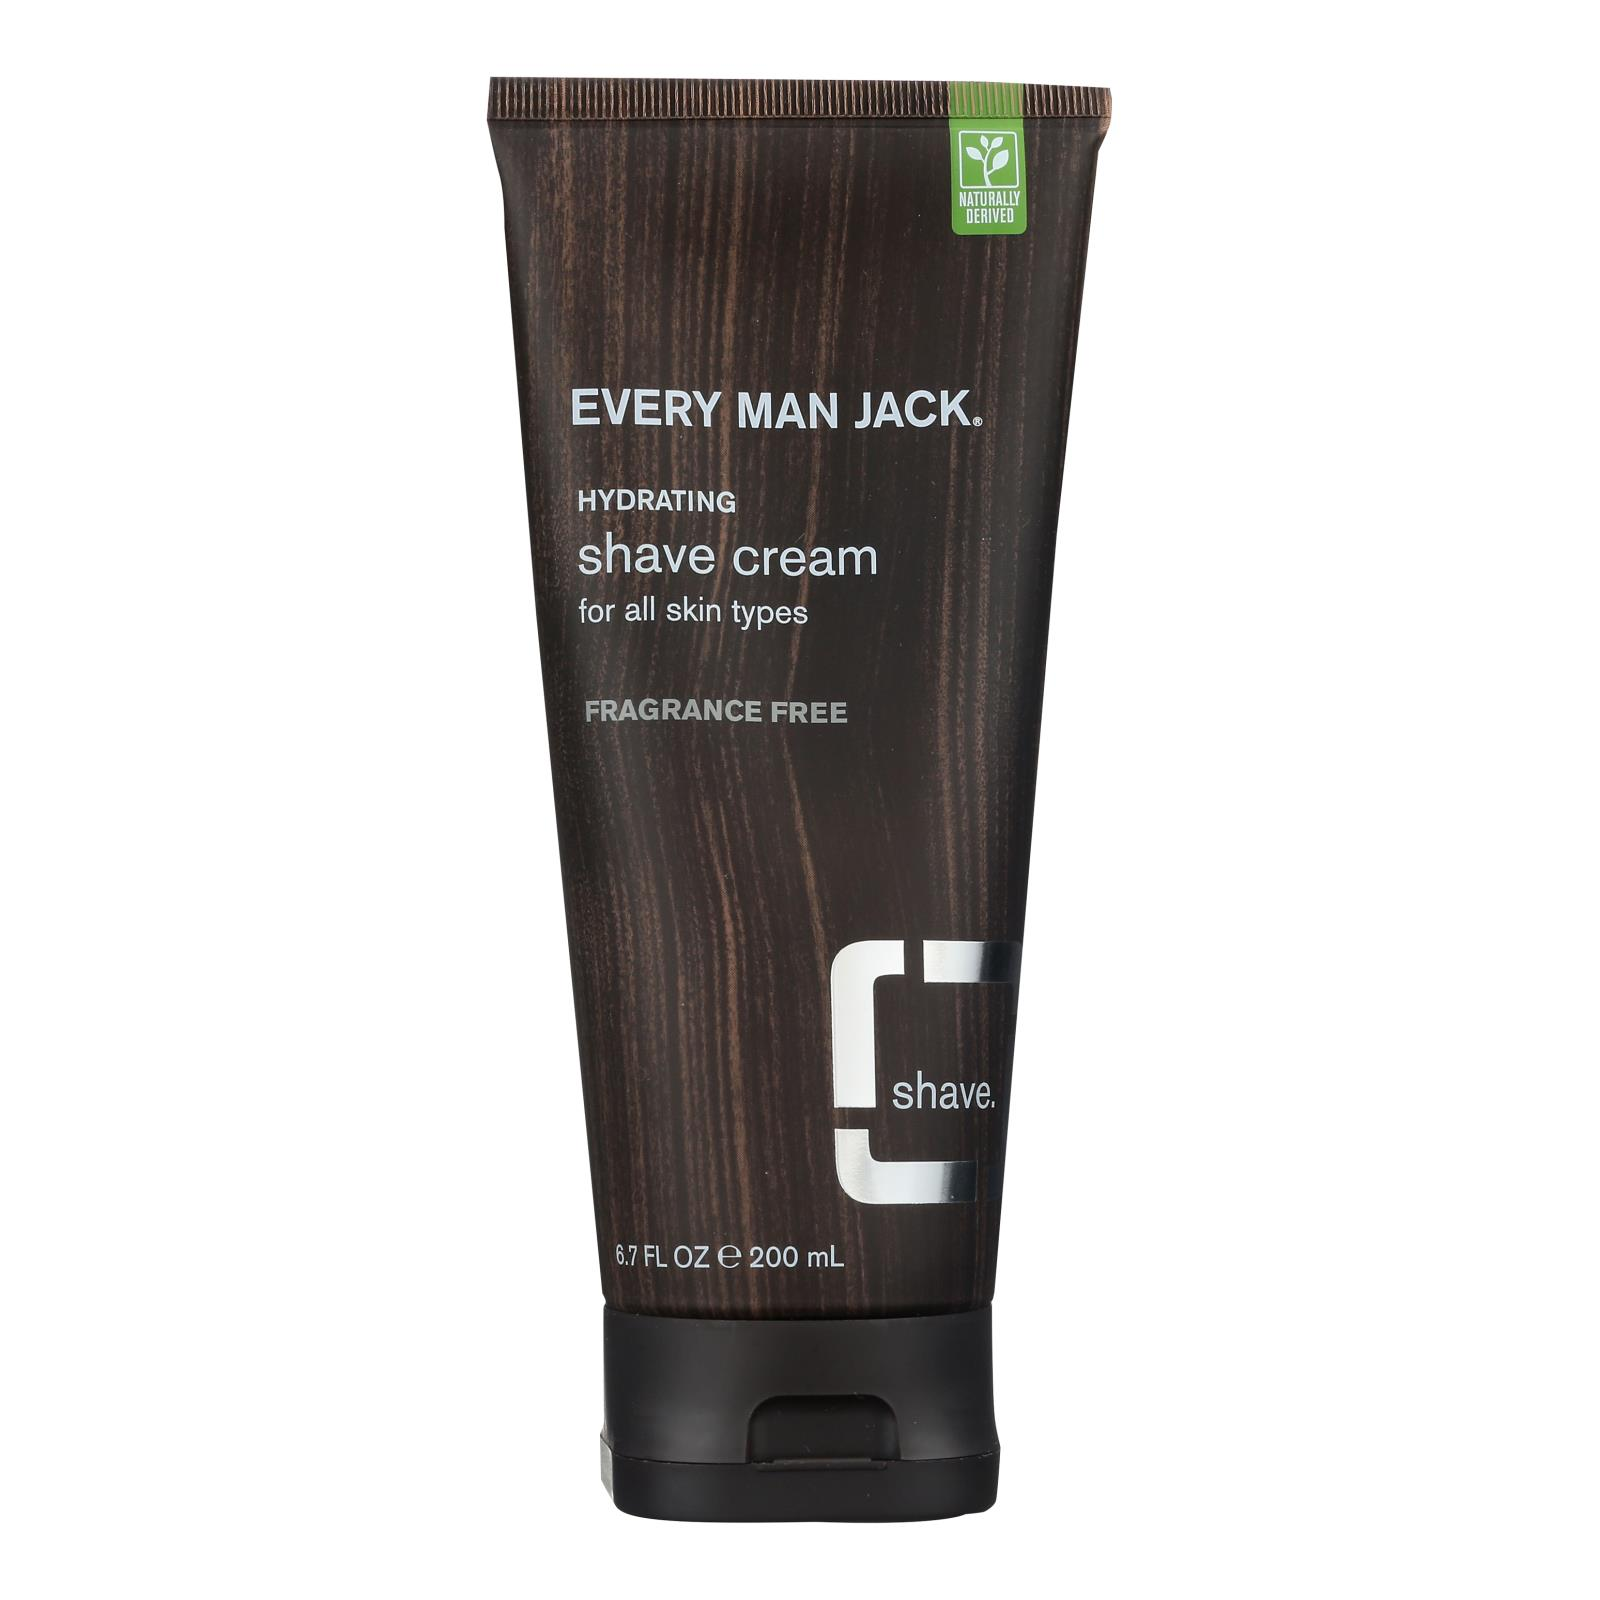 Every Man Jack Shave Cream - Sensitive Skin - Fragrance Free - 6.7 oz